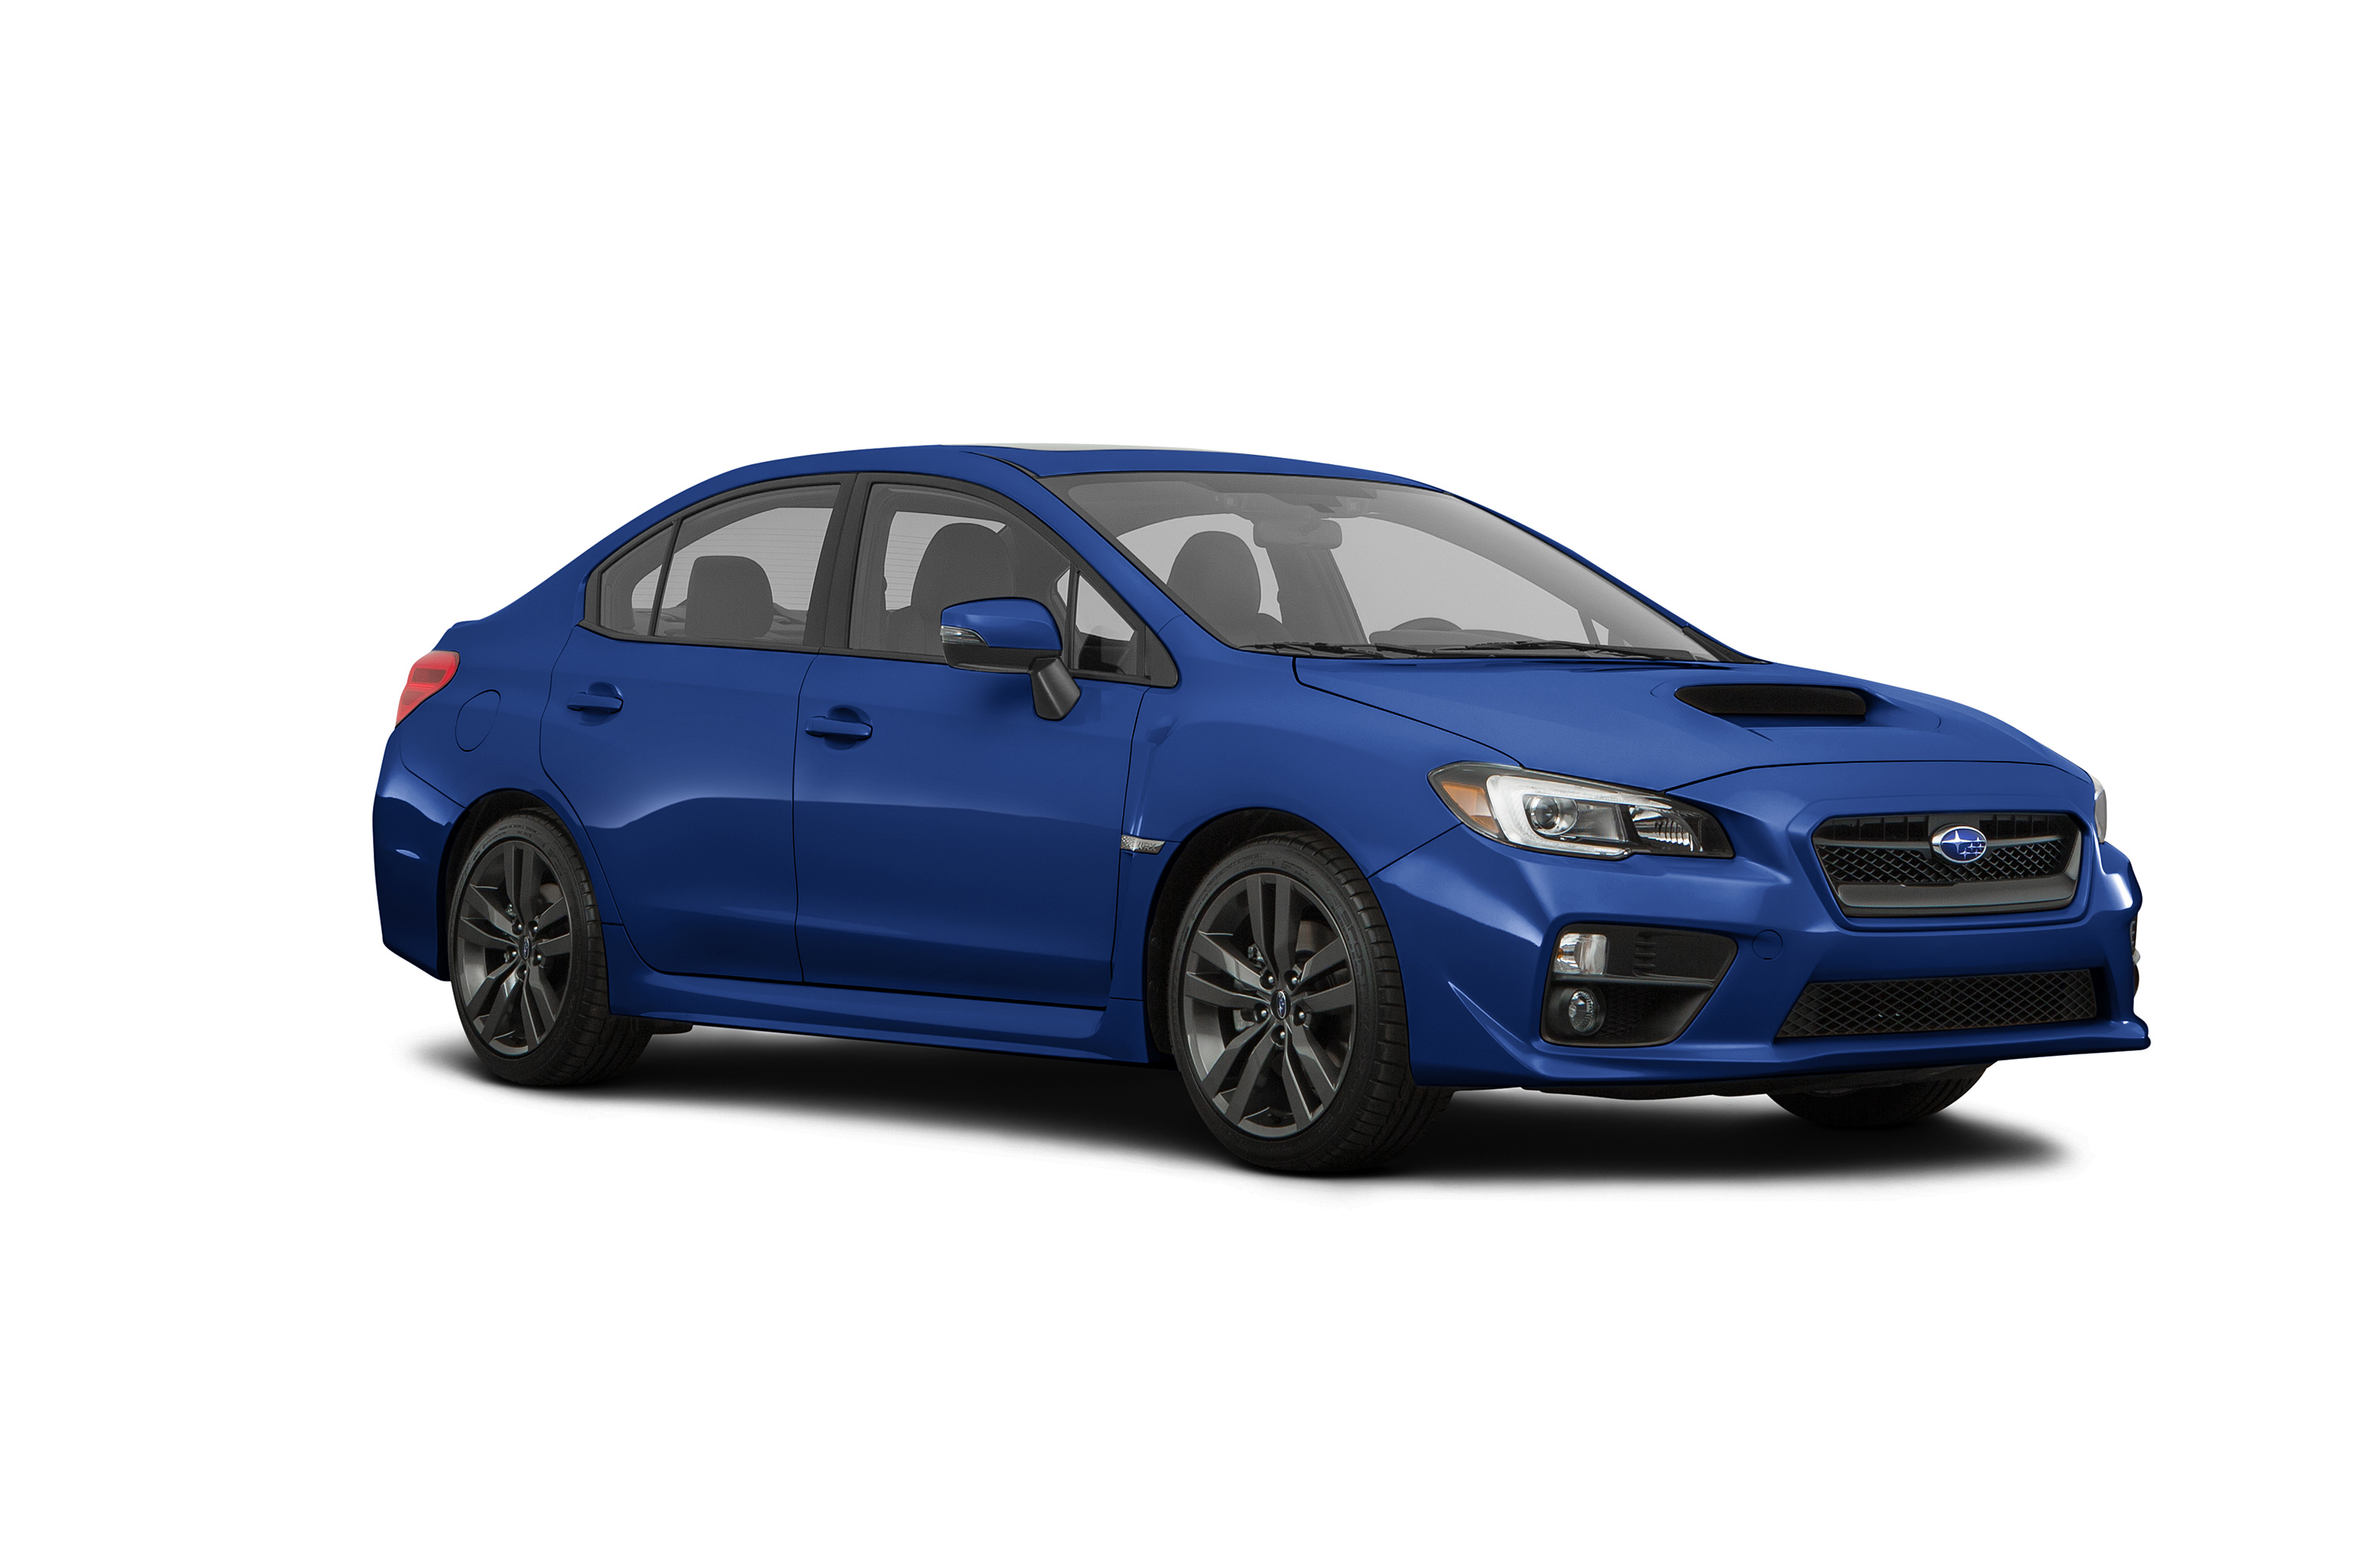 Shop Genuine 2018 Subaru Wrx Accessories Subaru Of America